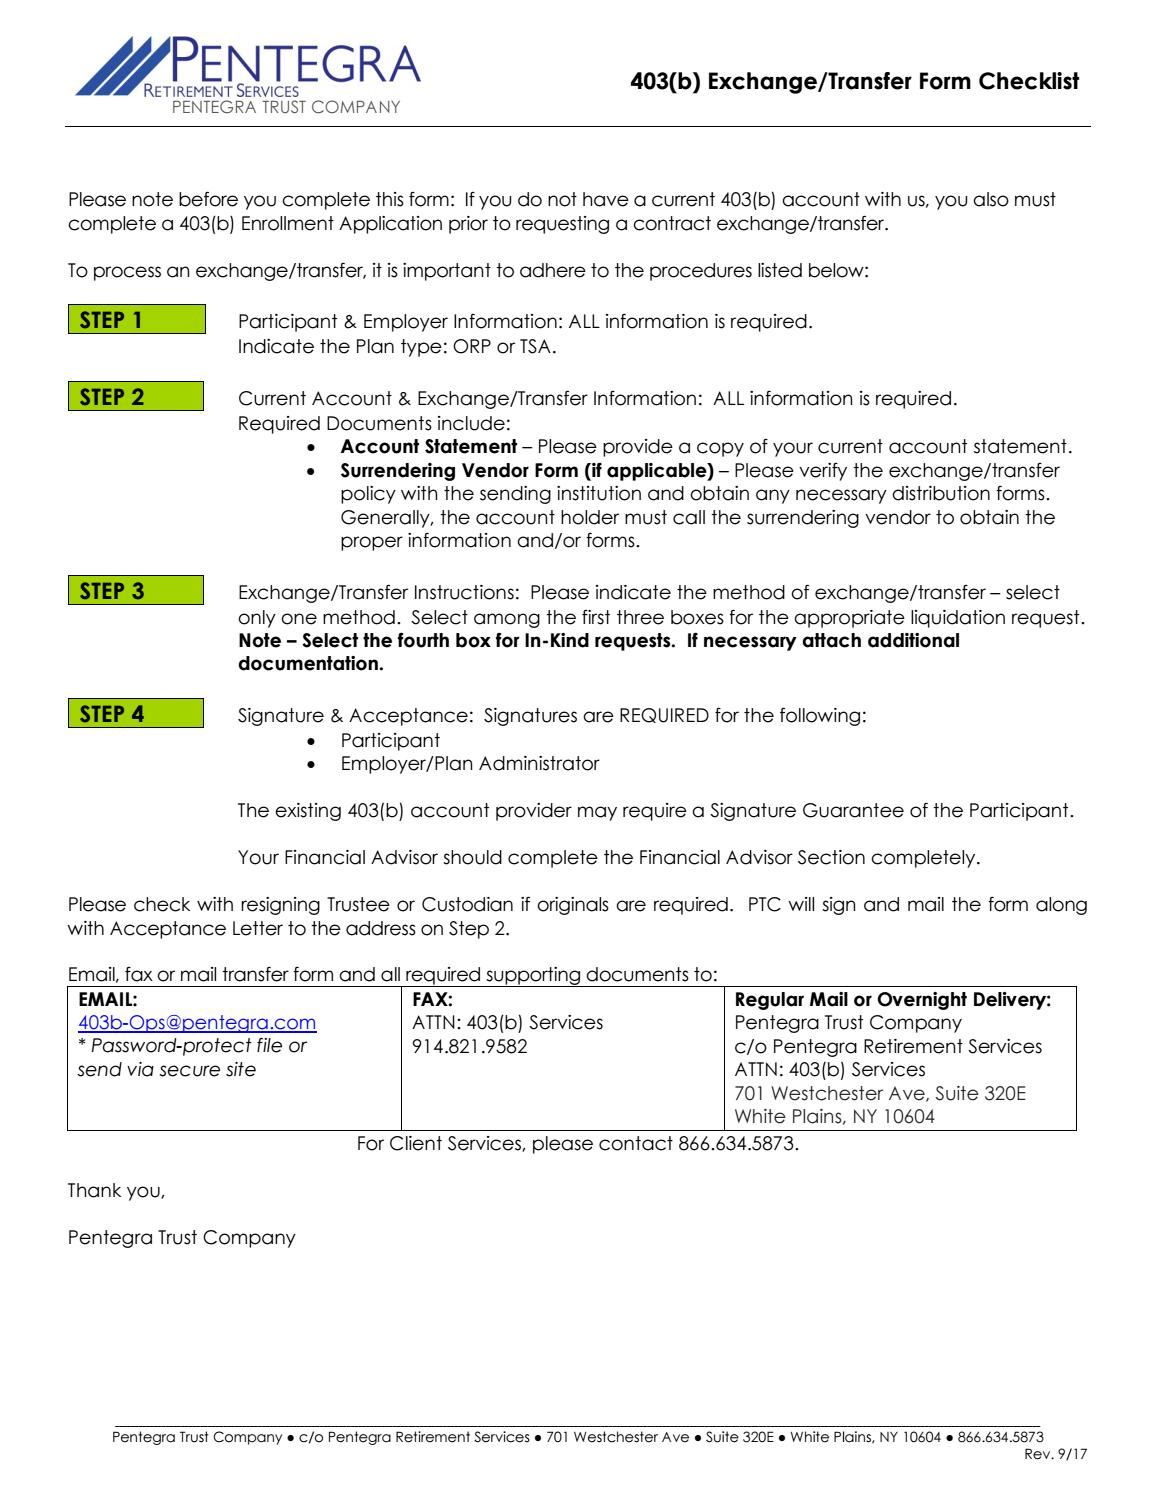 403b Exchange Transfer Form Checklist by pentegra - issuu